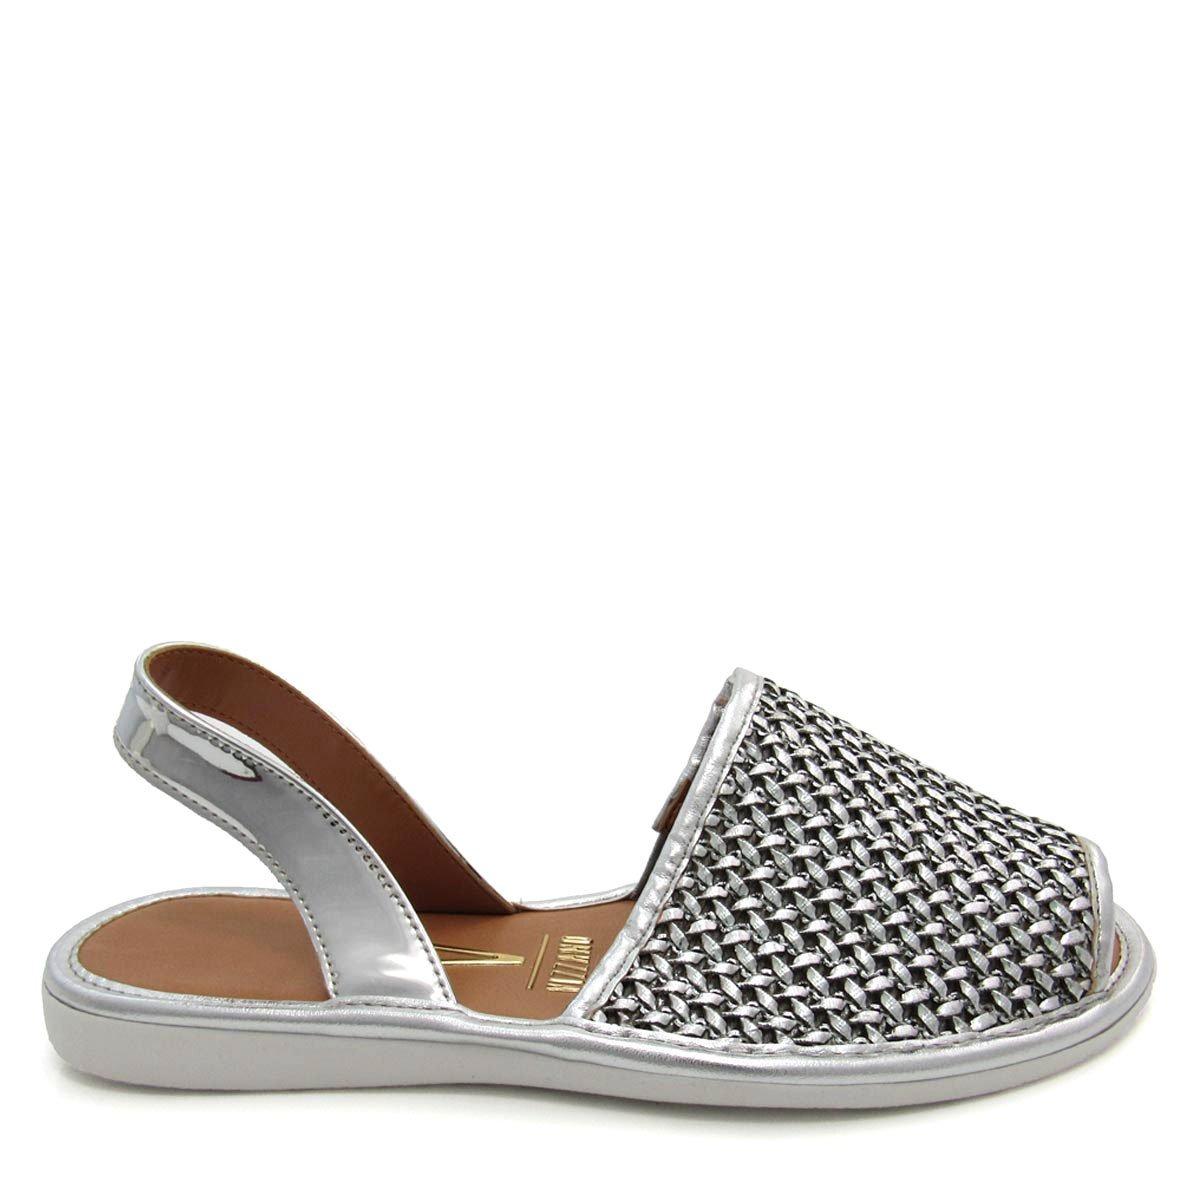 19a8f96d78 sandália rasteira feminina vizzano 6280130 avarca metalizada. Carregando  zoom.